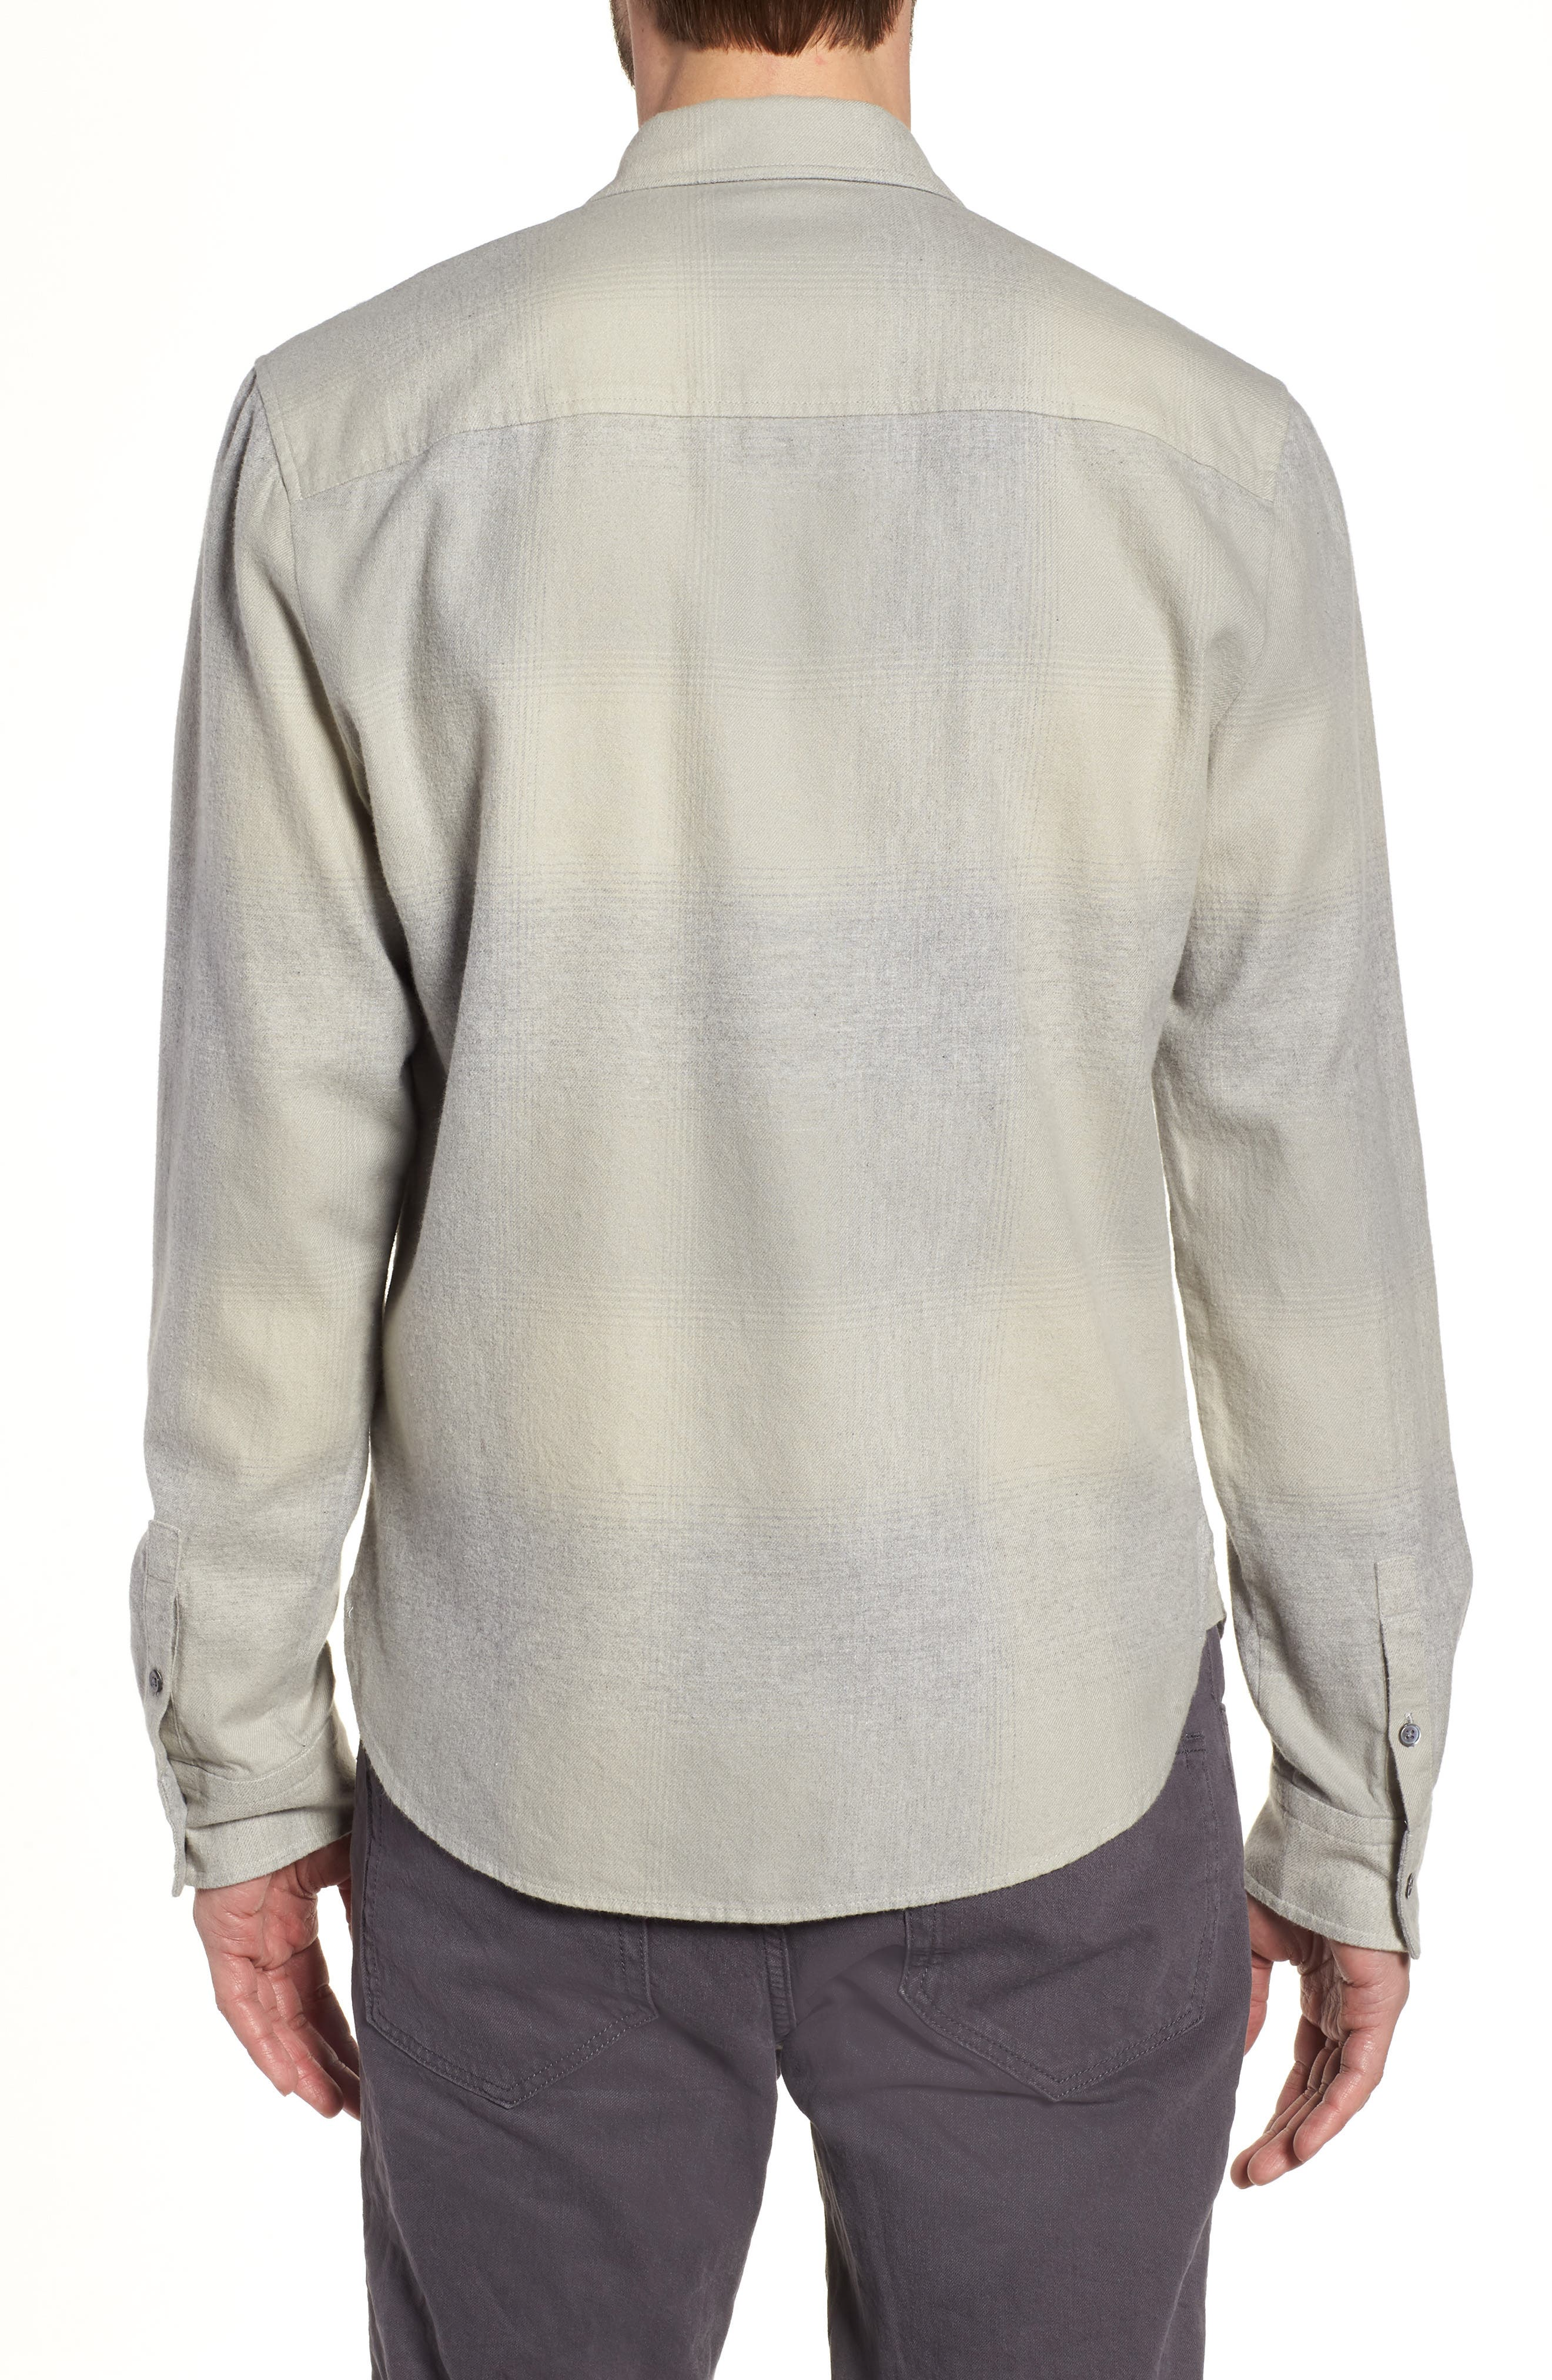 JAMES PERSE,                             Ghost Regular Fit Plaid Sport Shirt,                             Alternate thumbnail 2, color,                             086